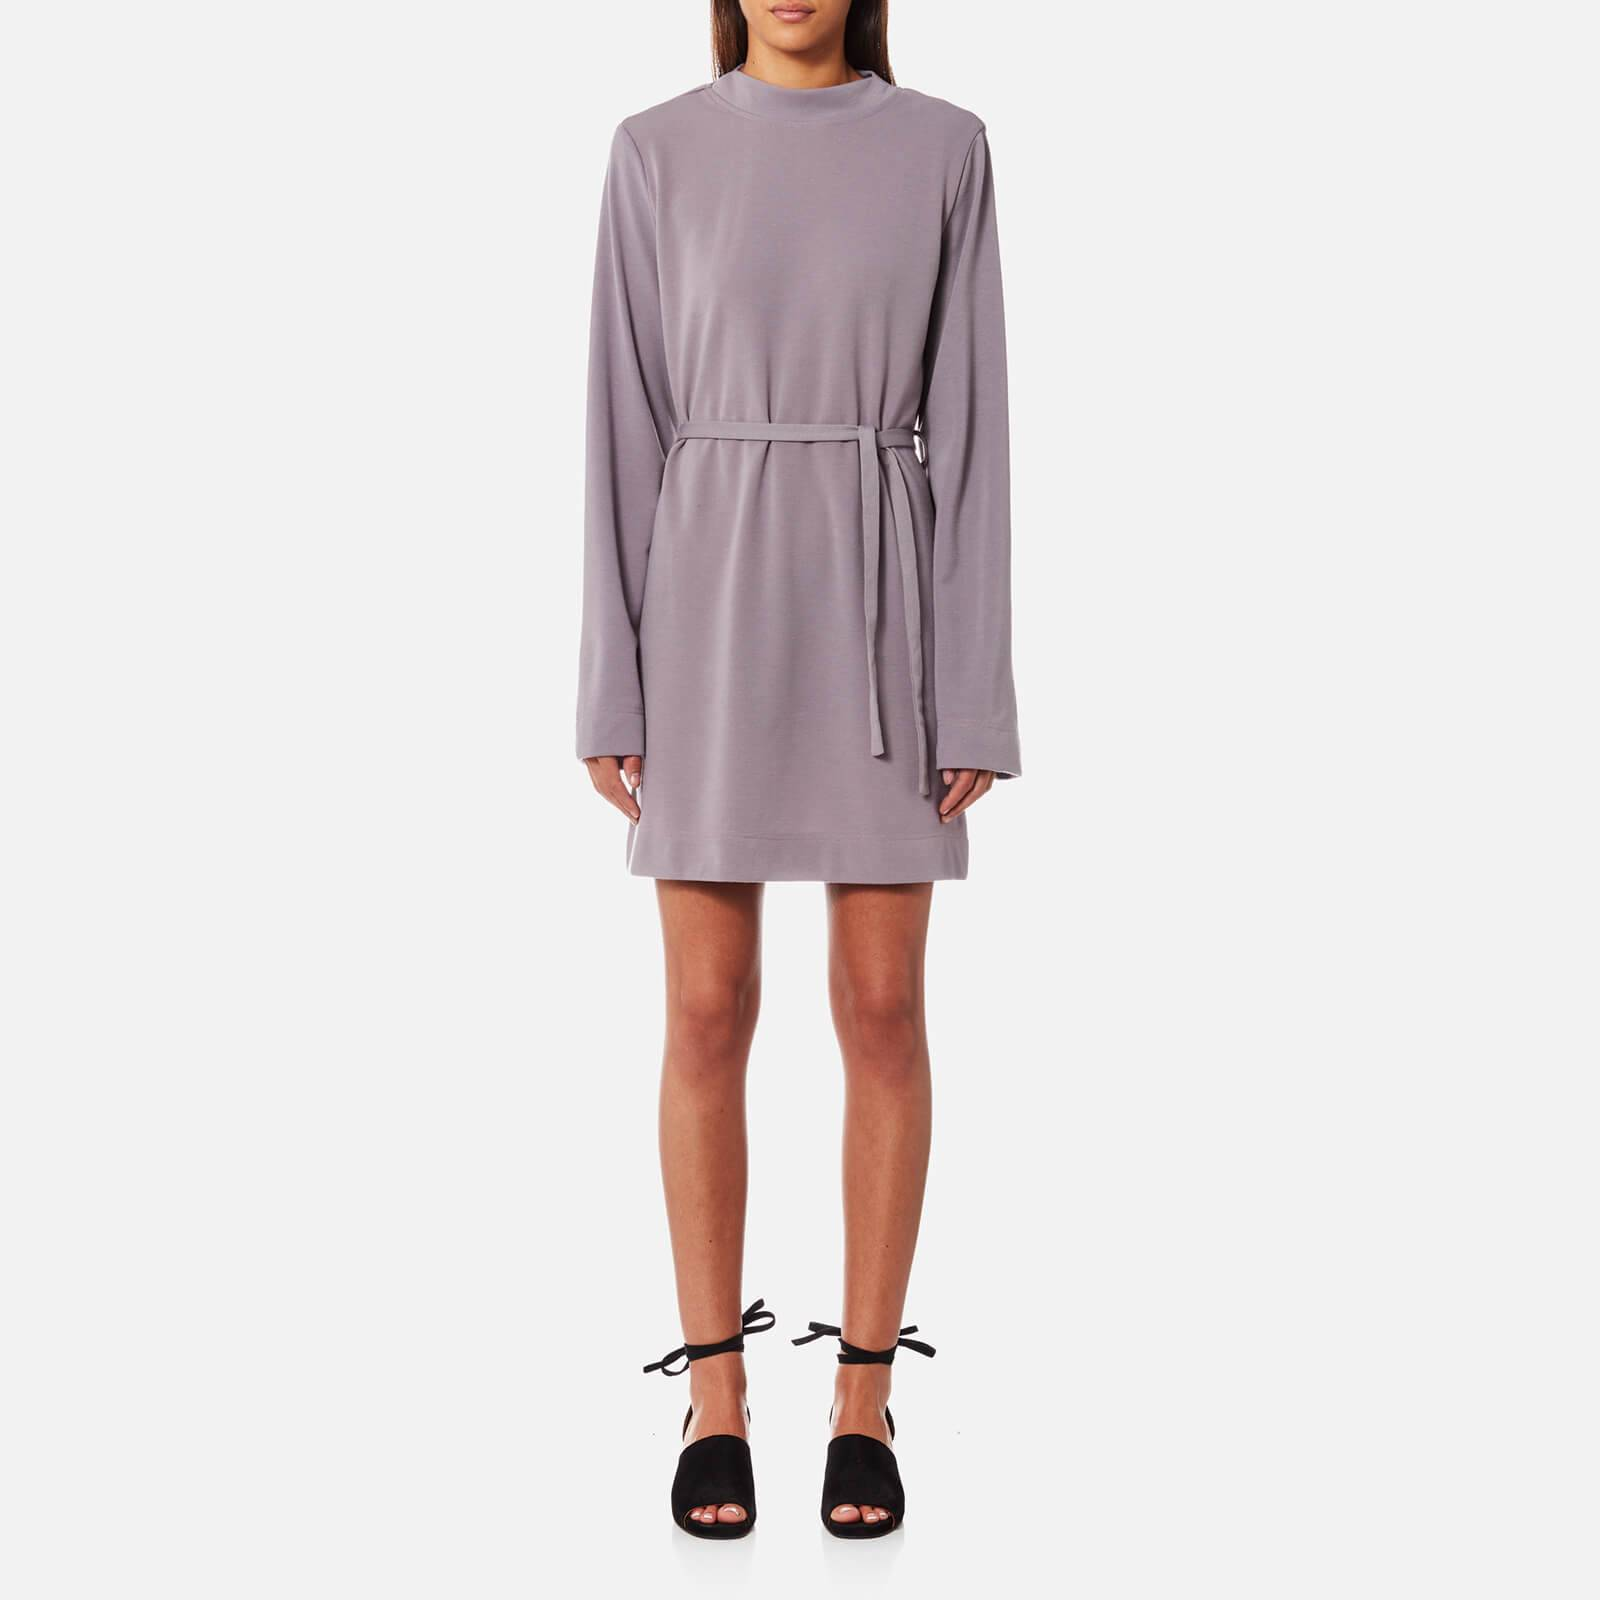 House of Sunny Women's Kicker T-Shirt Long Sleeve Dress - Sweet Lilac - UK 8 - Purple